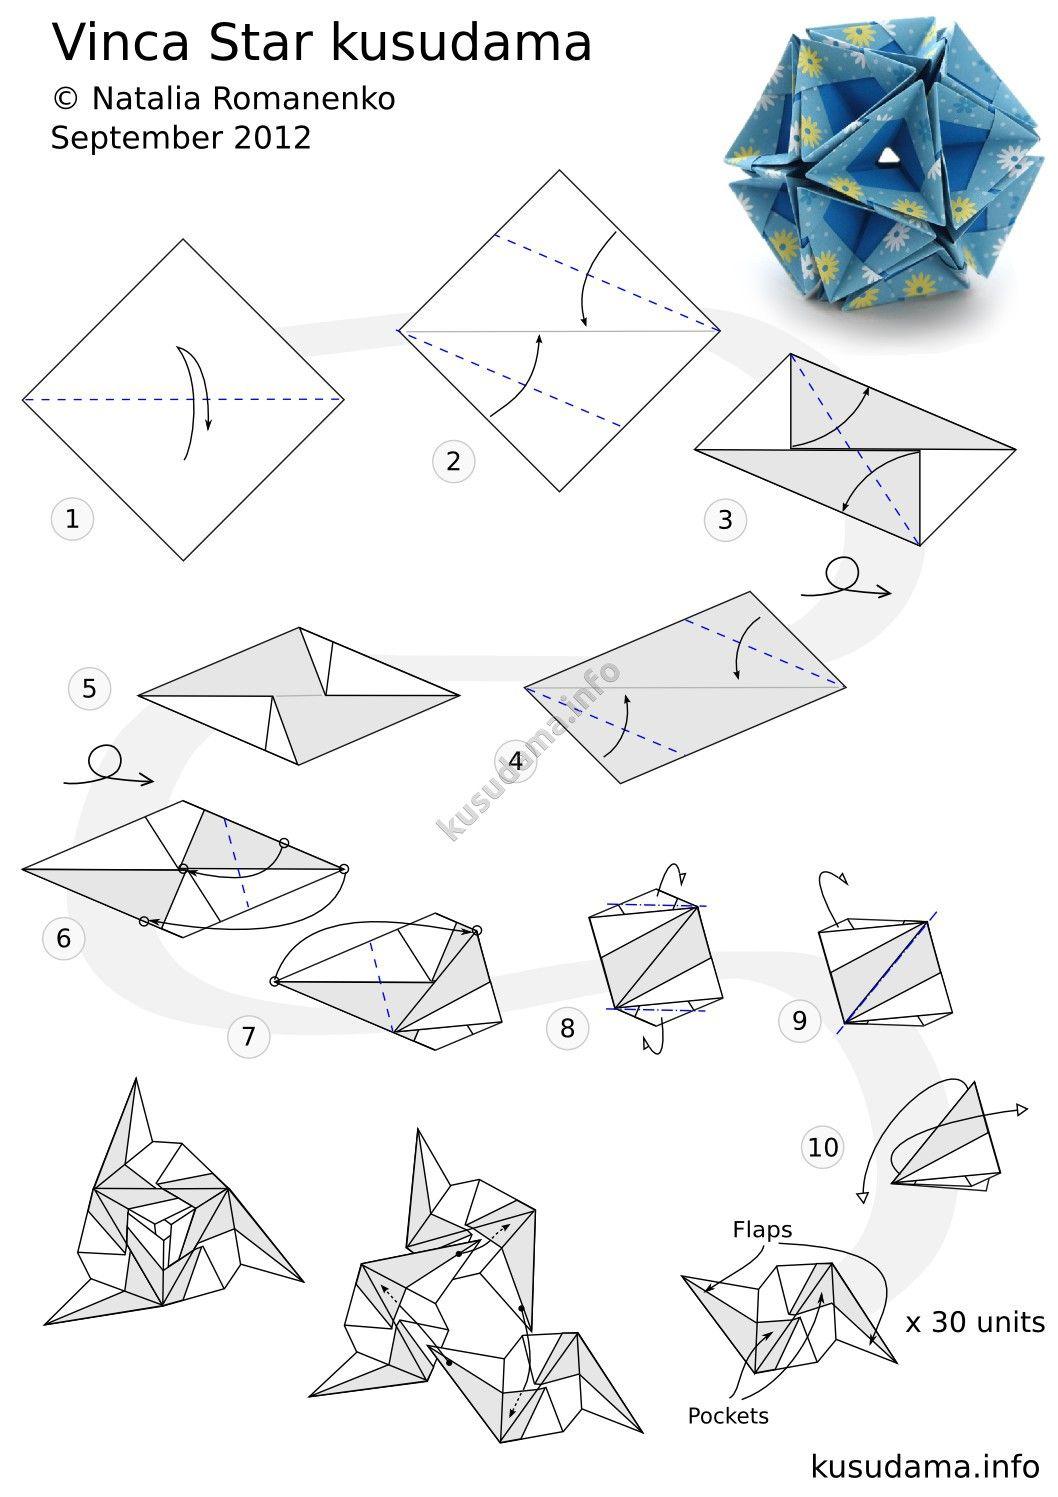 Kusudama Ball Diagram Yamaha Outboard Wiring Gauges Vinca Star  Origami Origa